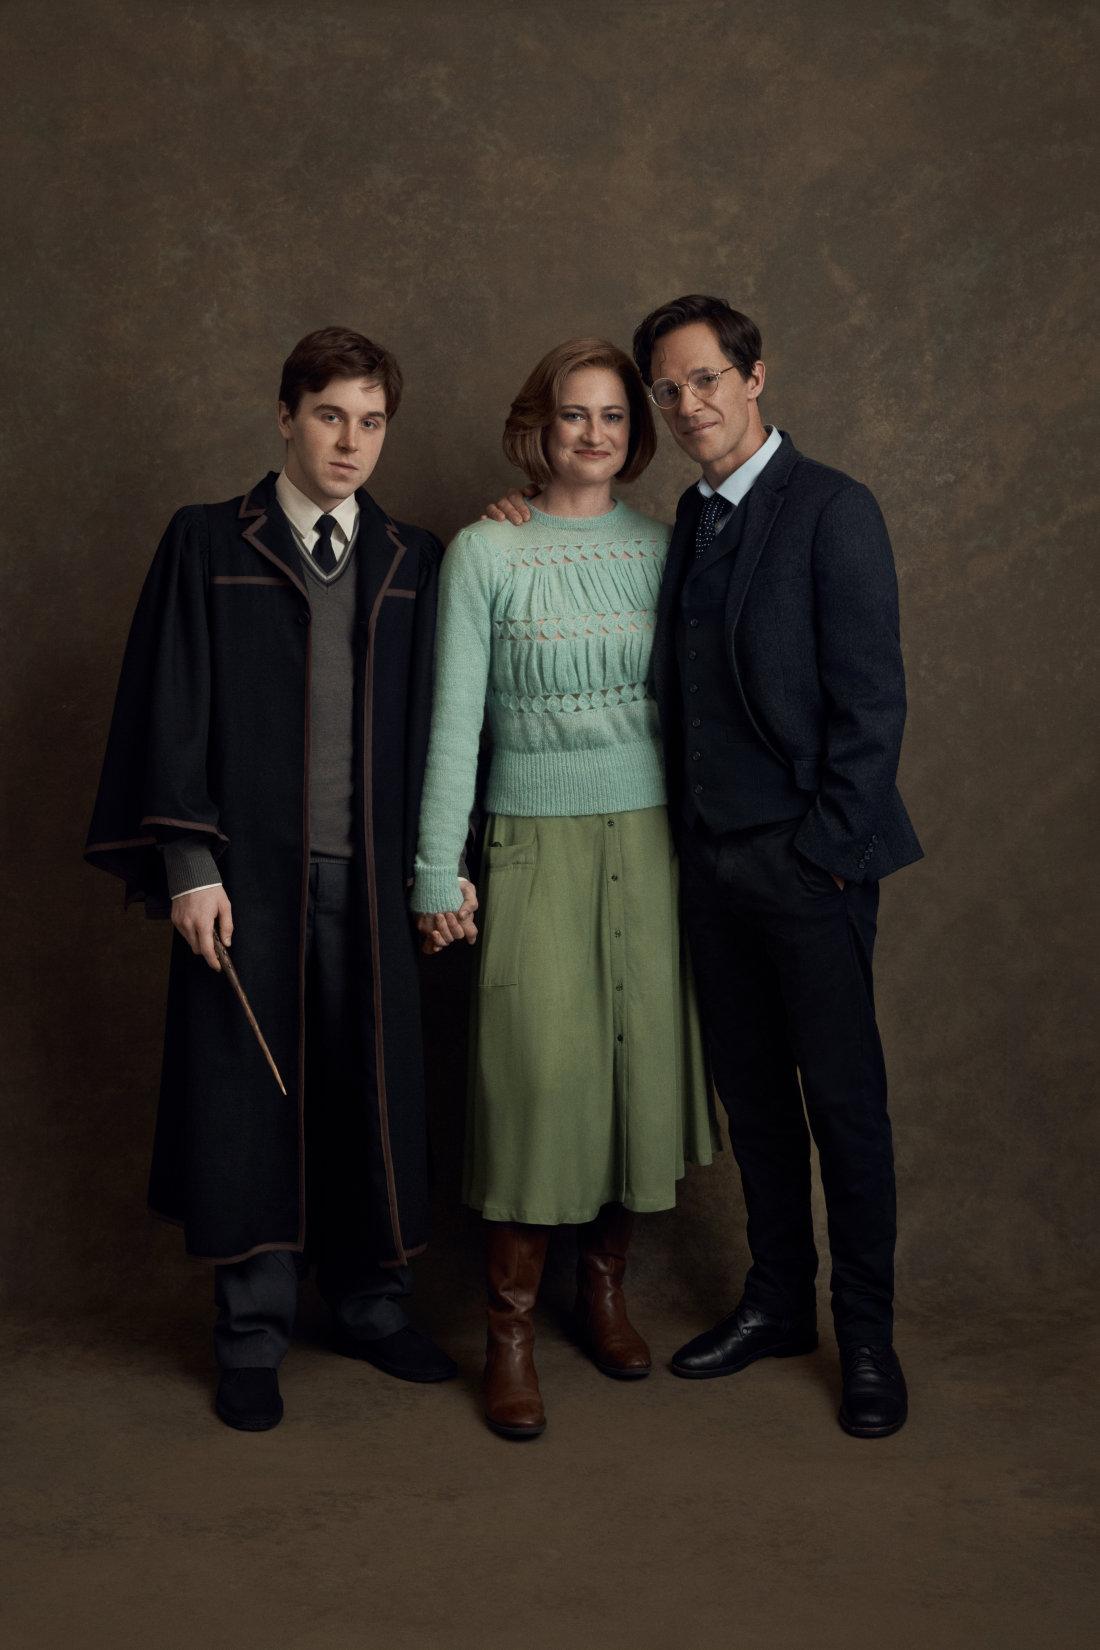 https://images.ctfassets.net/bxd3o8b291gf/Idz8TLB25gNDxoSard7aG/921ff88c99a32971ac0d81615c7cf576/181217_Harry_Potter24130_fin.jpg?w=1100&q=85